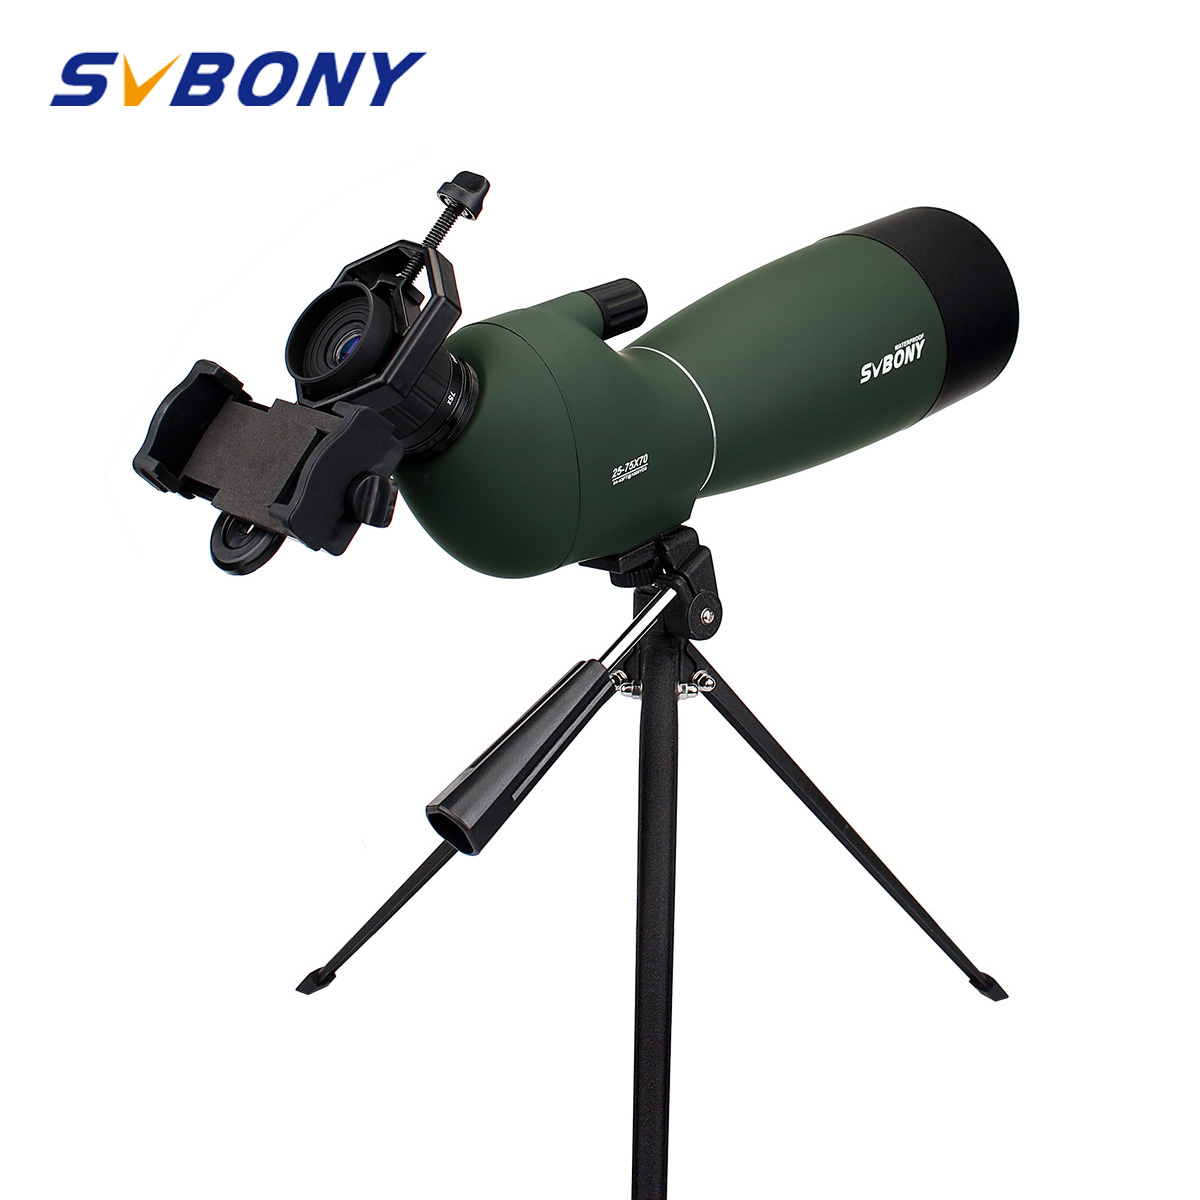 Svbony SV28 50 60 70mm Spotting Scope Zoom Telescope Waterproof Birdwatch Hunting Monocular Universal Phone Adapter